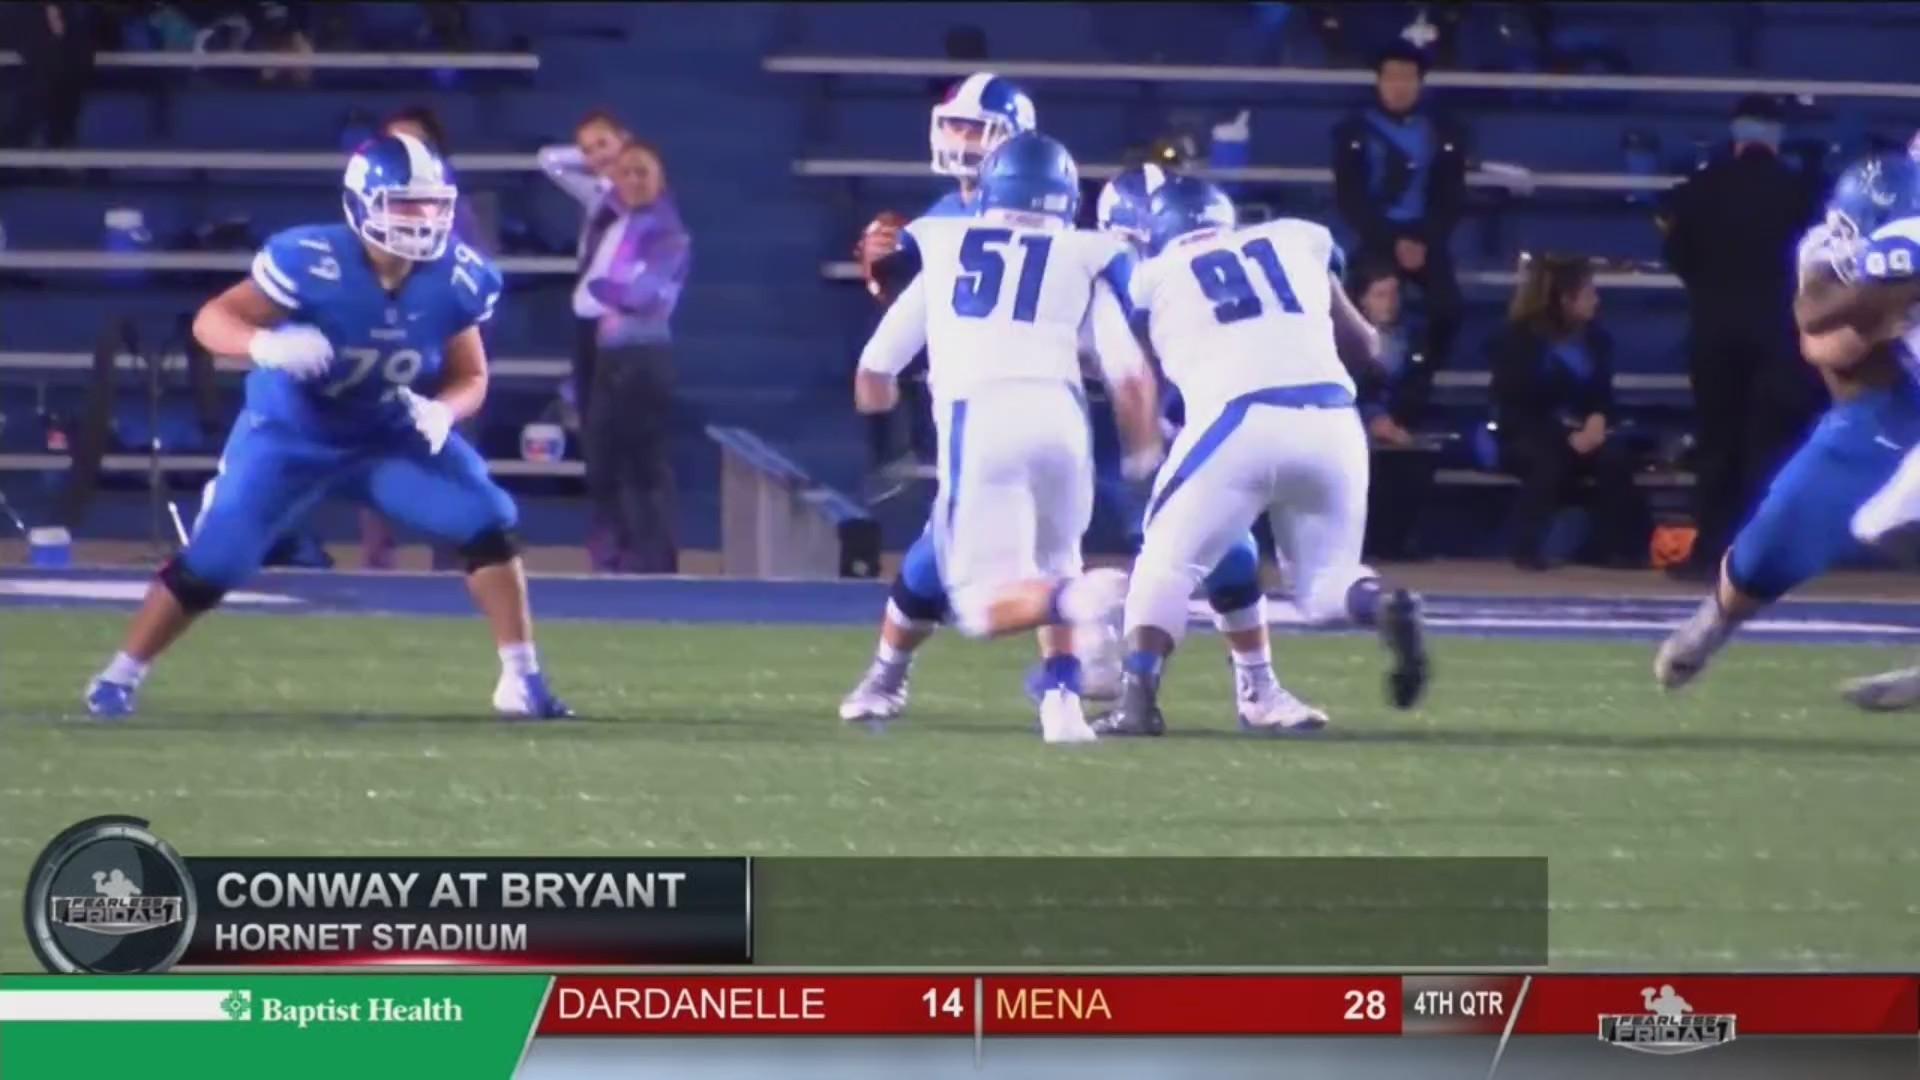 Bryant_vs_Conway_0_20181103043319